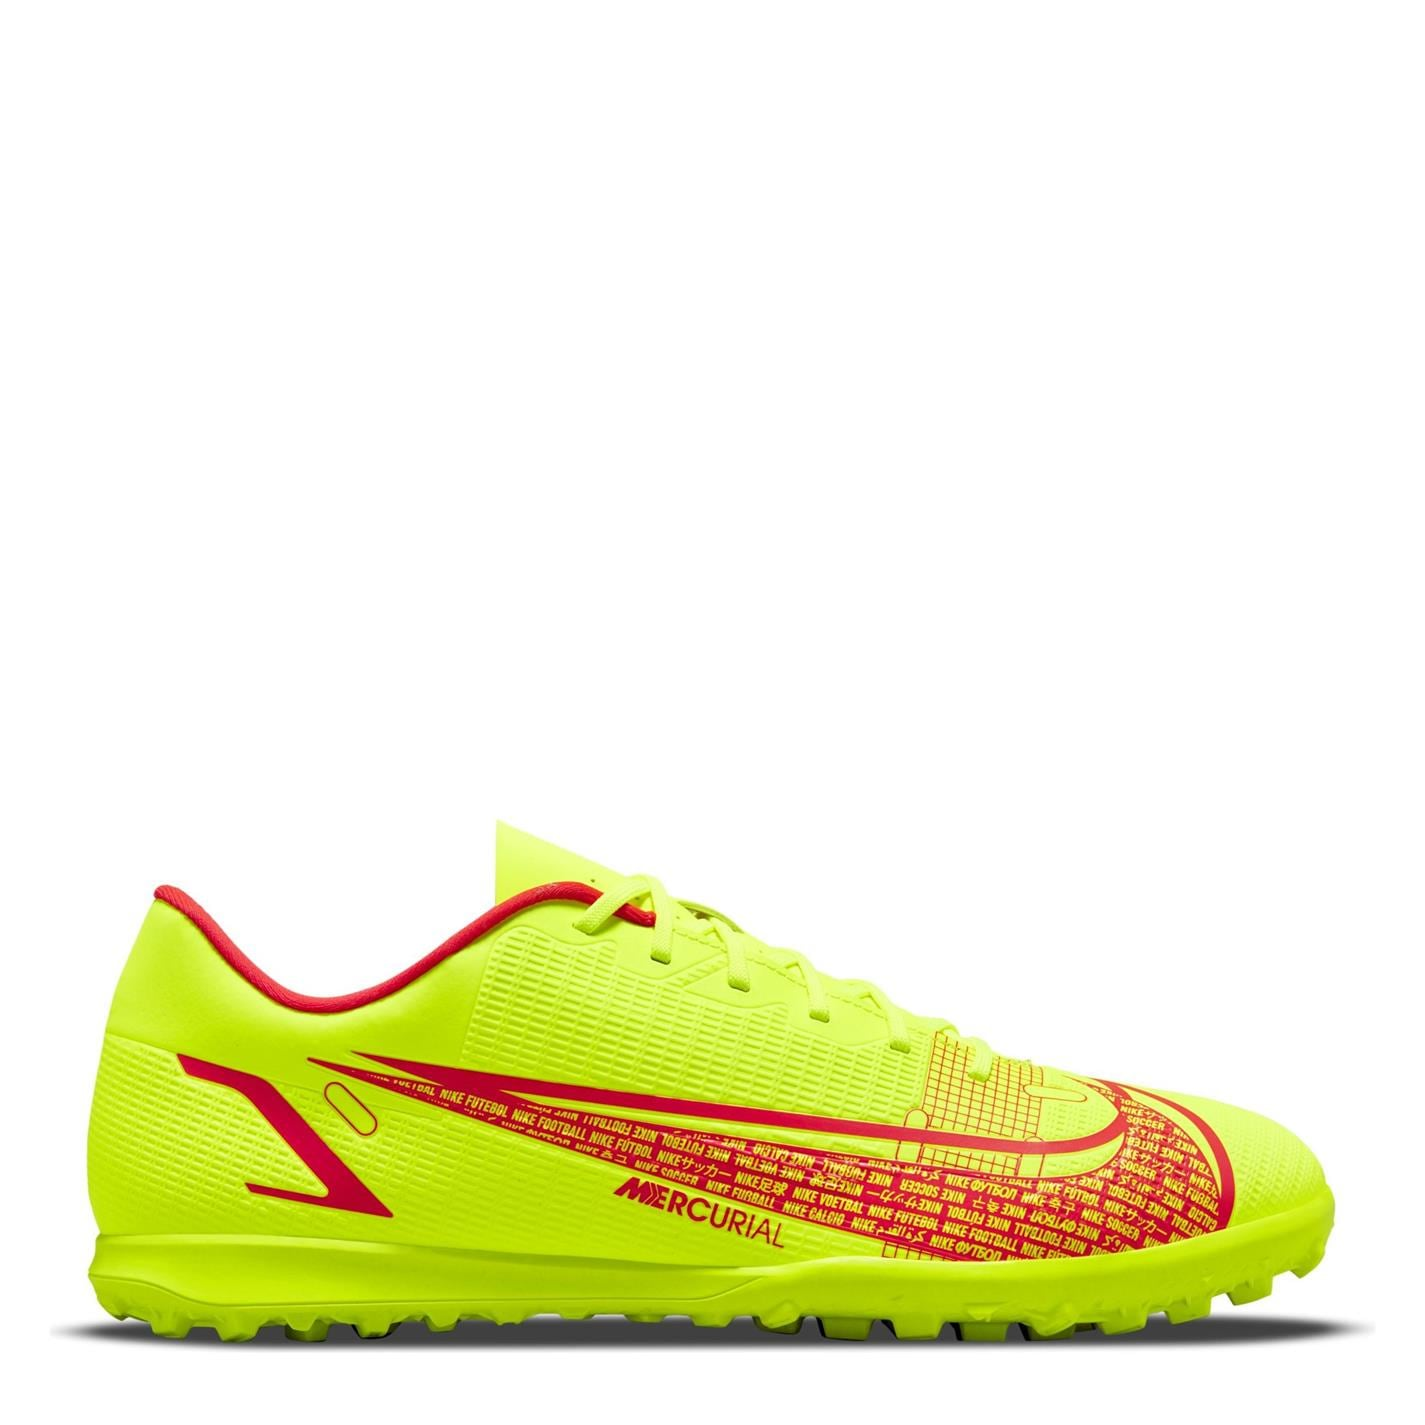 Adidasi Gazon Sintetic Nike Mercurial Vapor Club galben rosu inchis